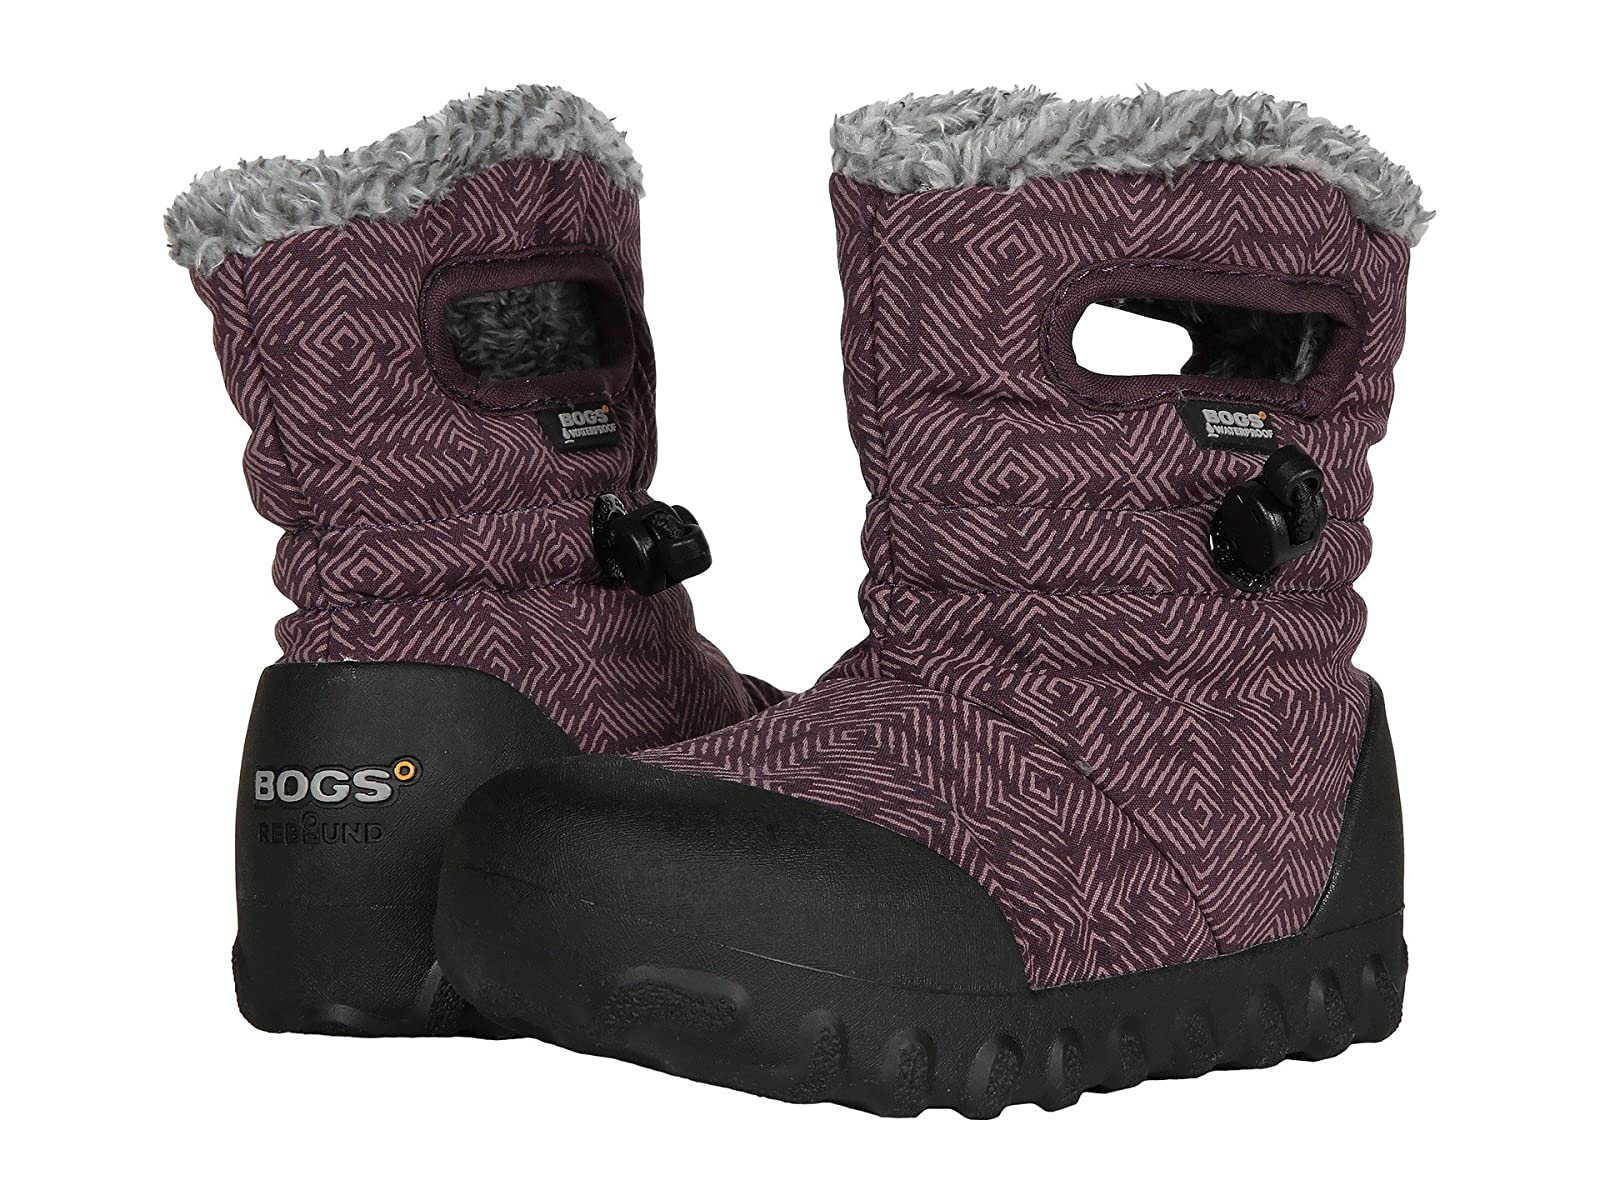 Bogs Kids B-Moc Dash Puff (Toddler/Little Kid/Big Kid)Cheap and distinctive eye-catching shoes